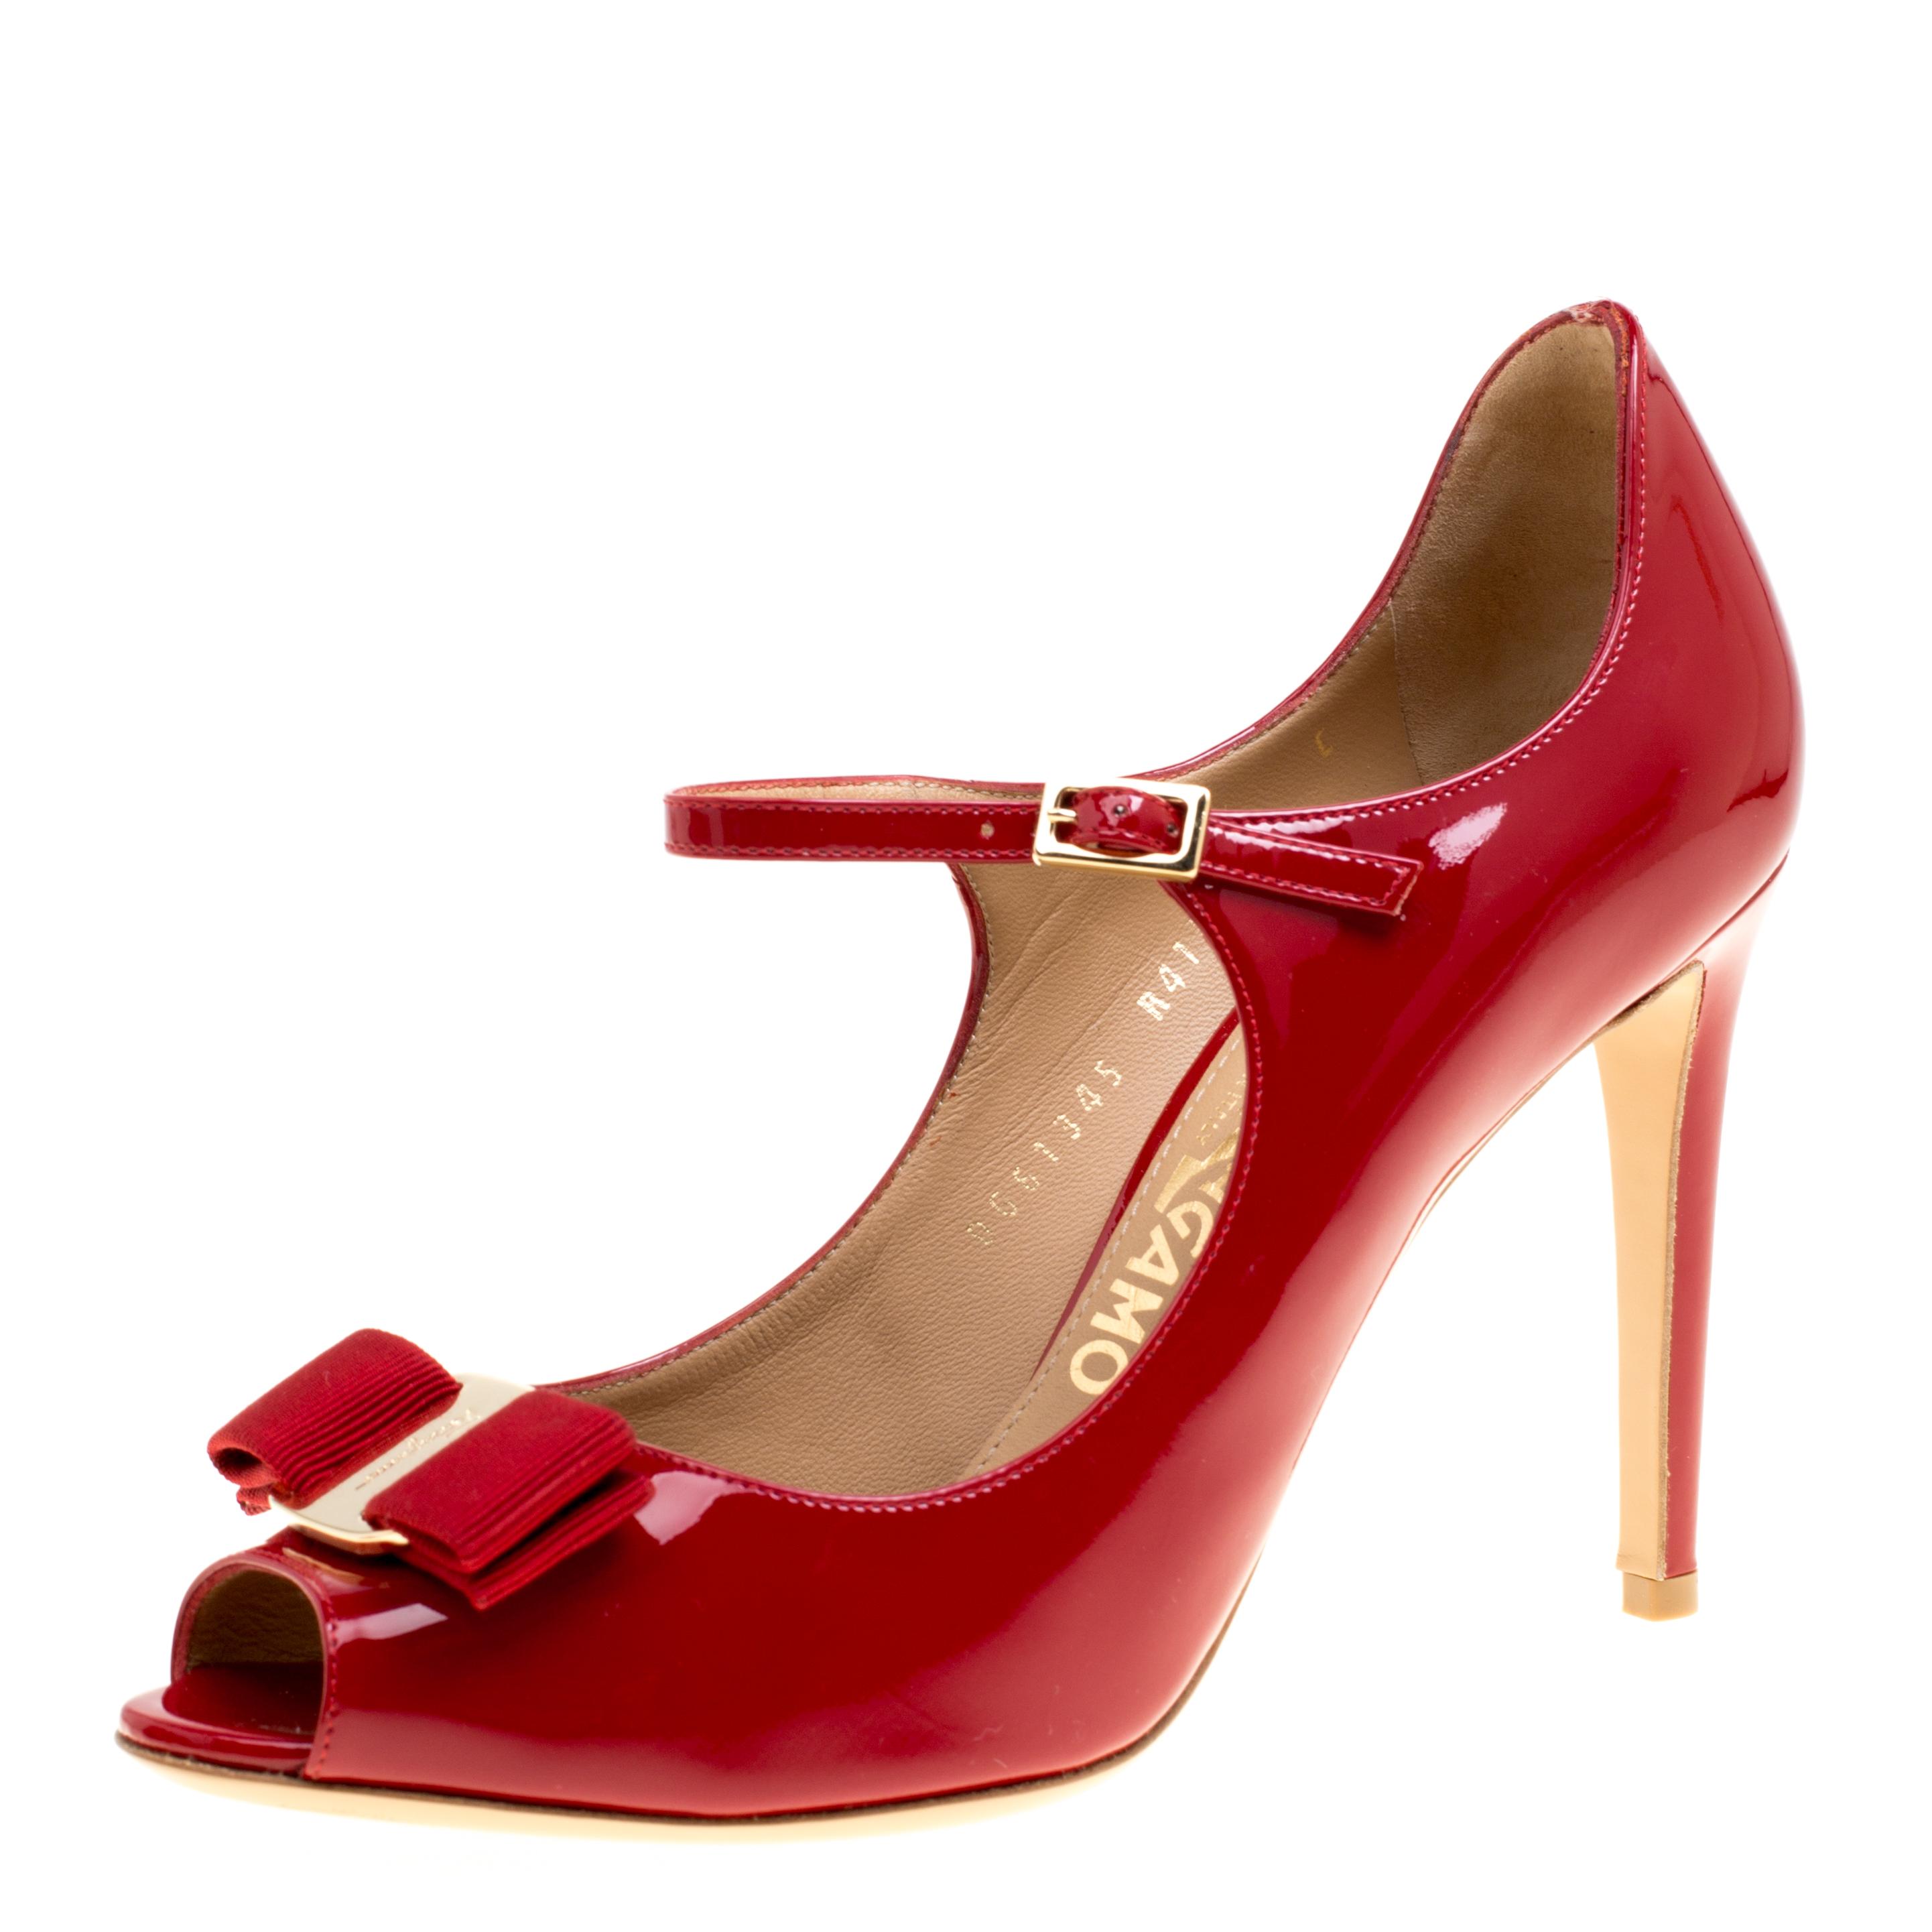 a2614156e91 Buy Salvatore Ferragamo Red Patent Leather Mood Vara Bow Peep Toe ...